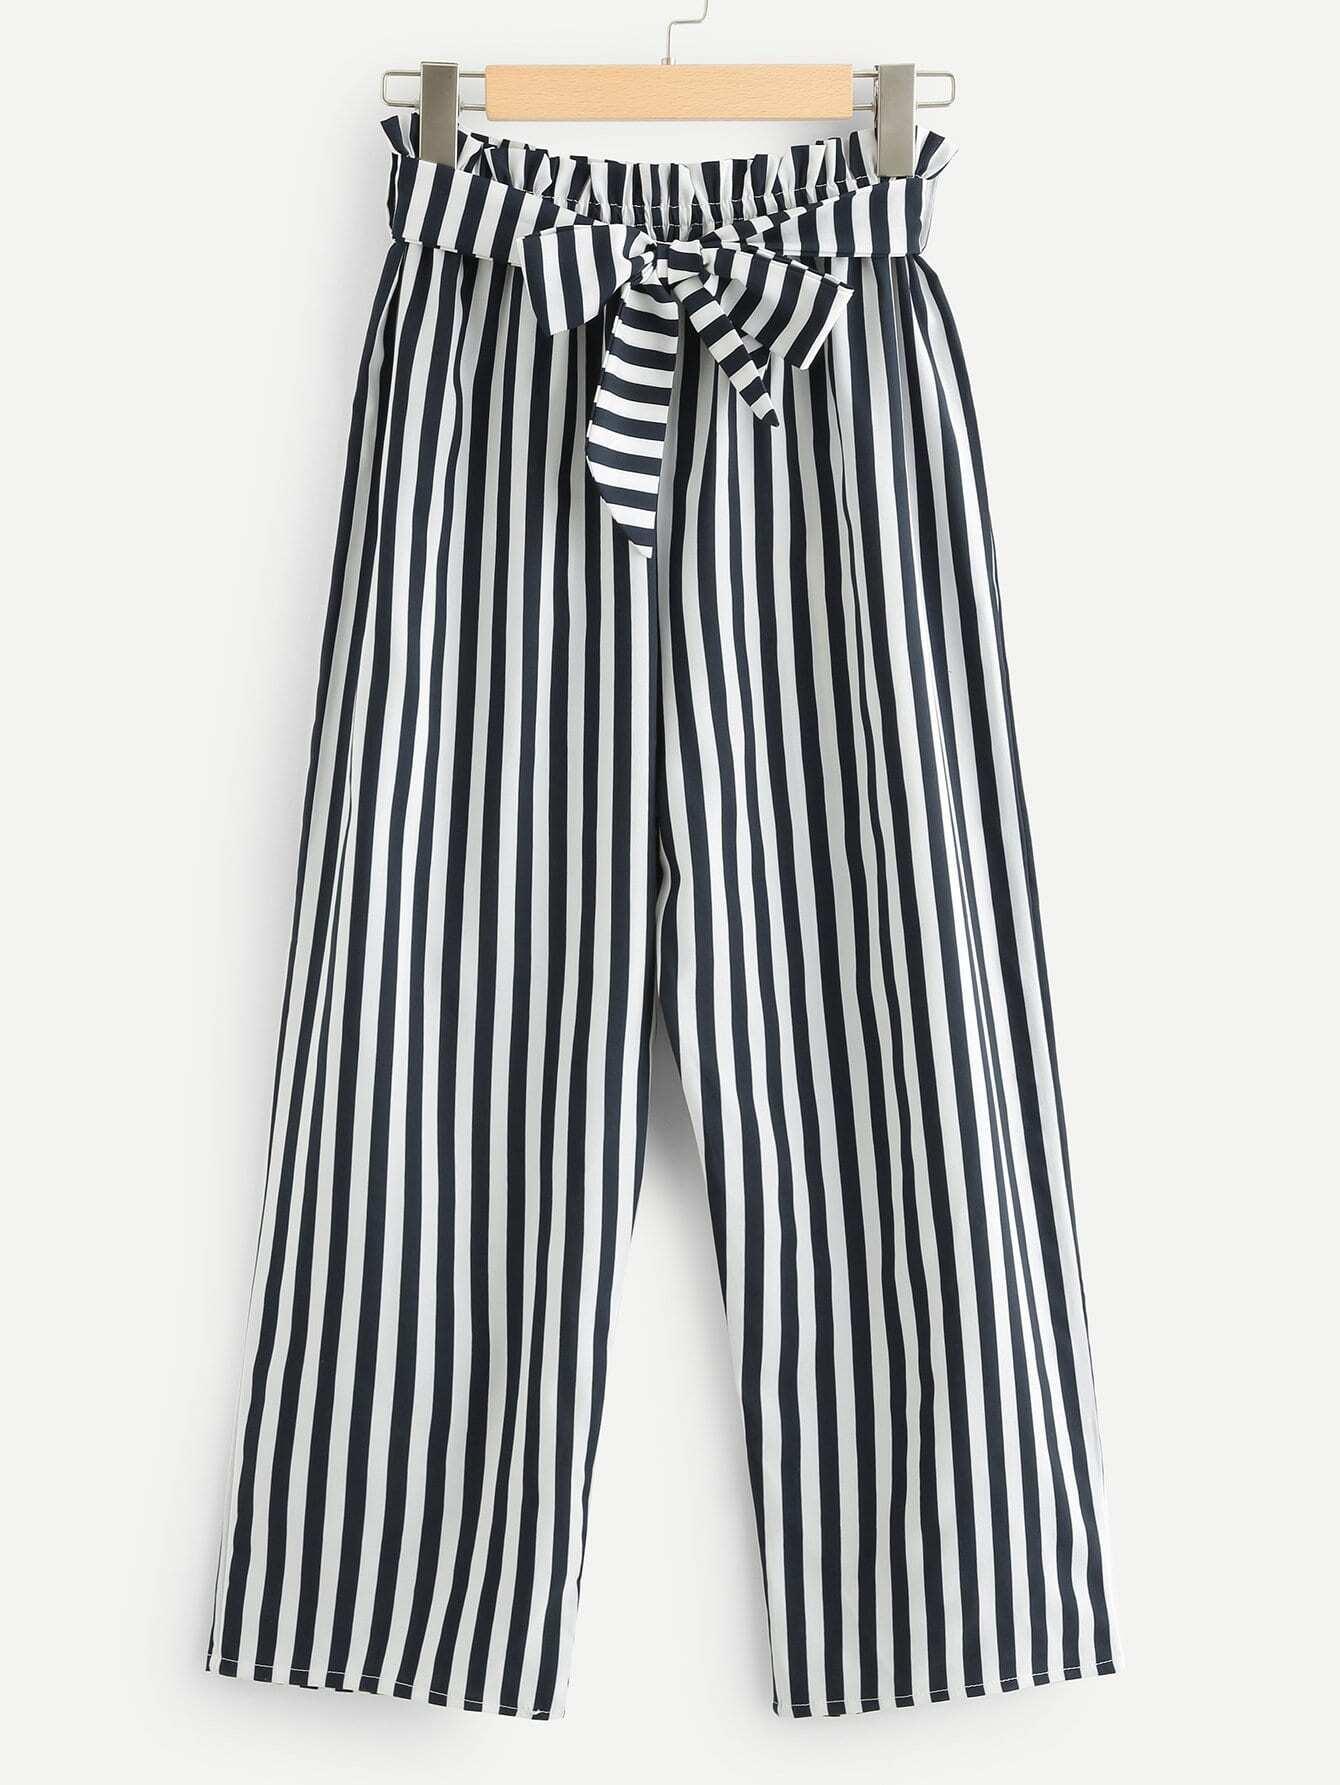 Self Tie Waist Striped Pants striped ruffled waist self tie pants